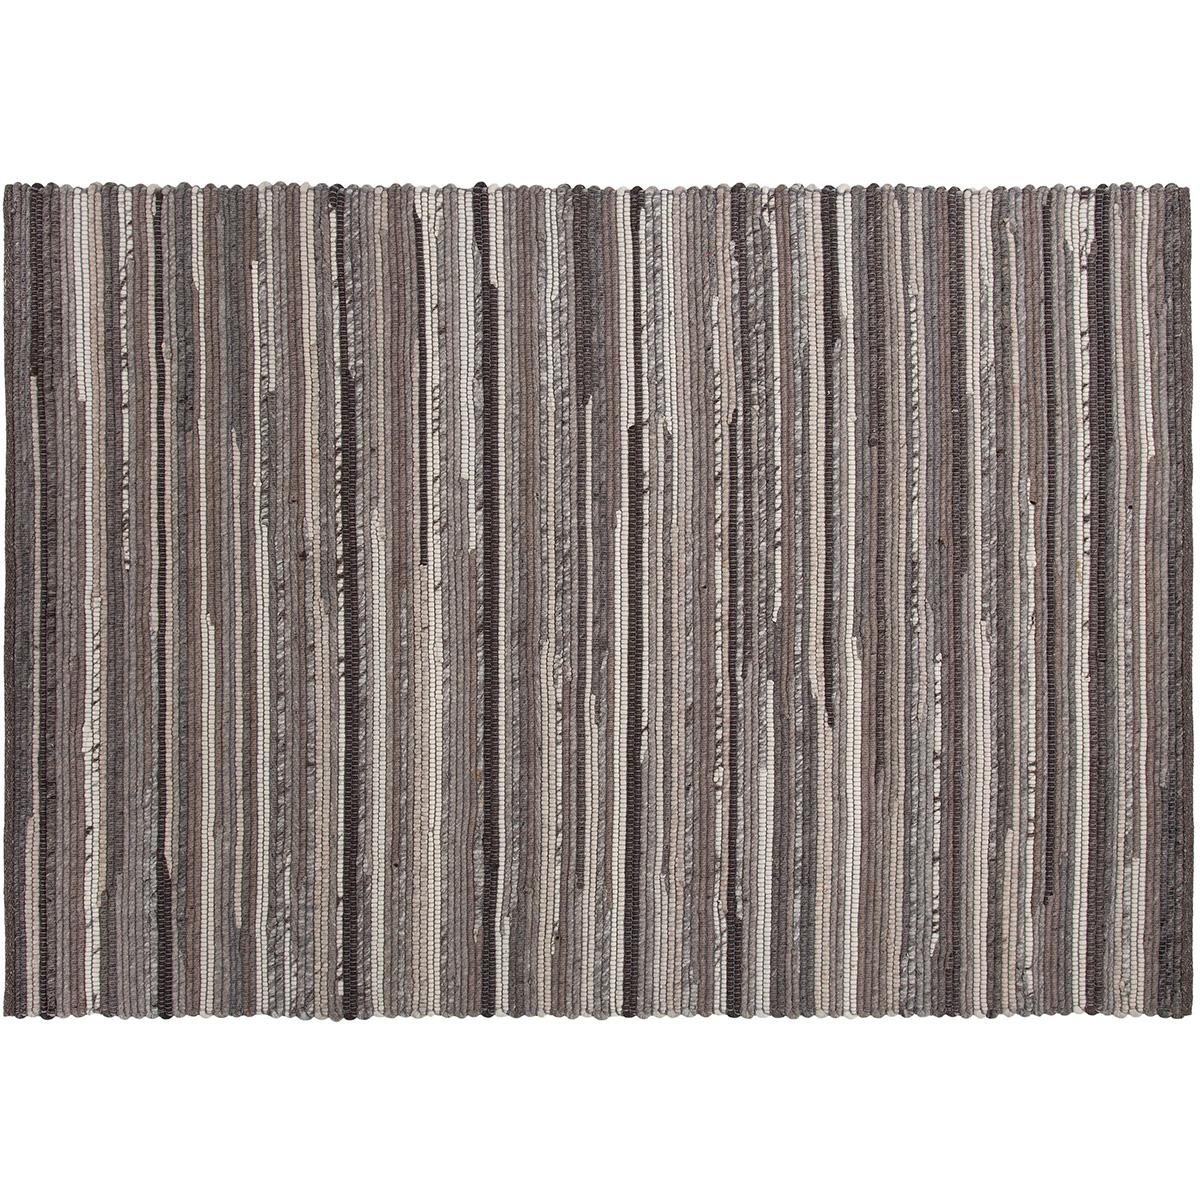 Vloerkleed Brinker Rockwerchter Grey Multi | 200 x 290 cm